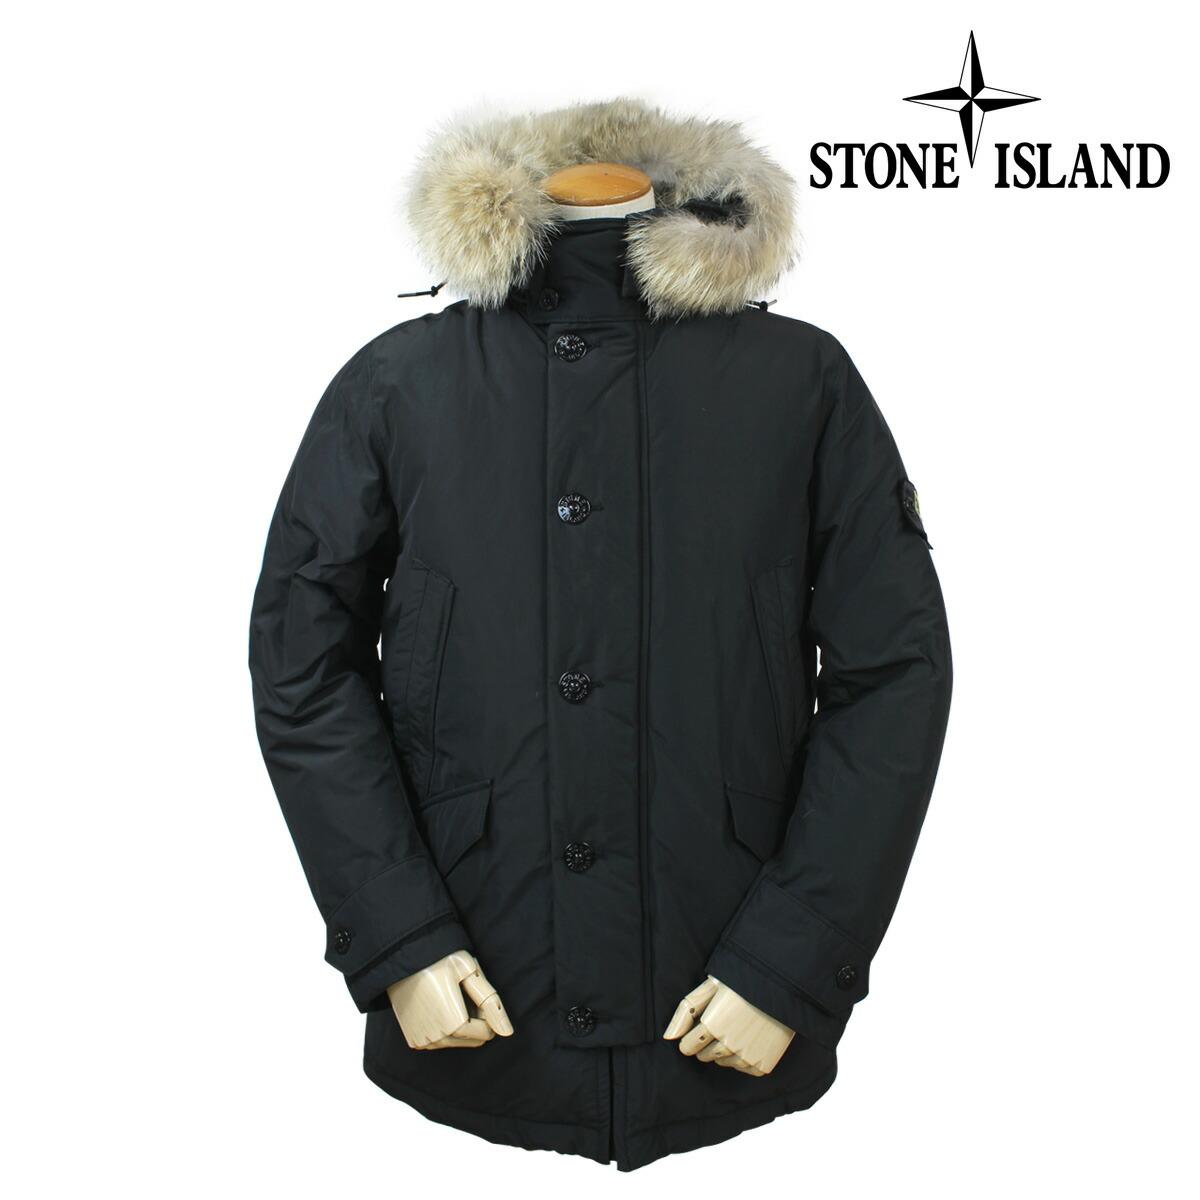 Stone island shop online